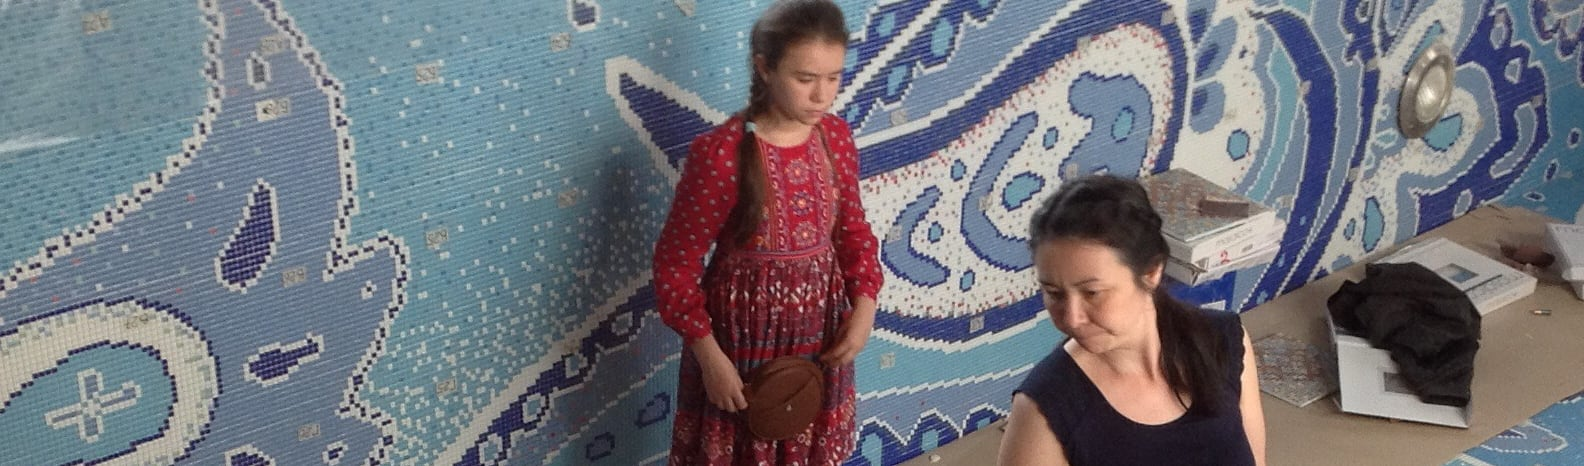 Хамам-мозаика